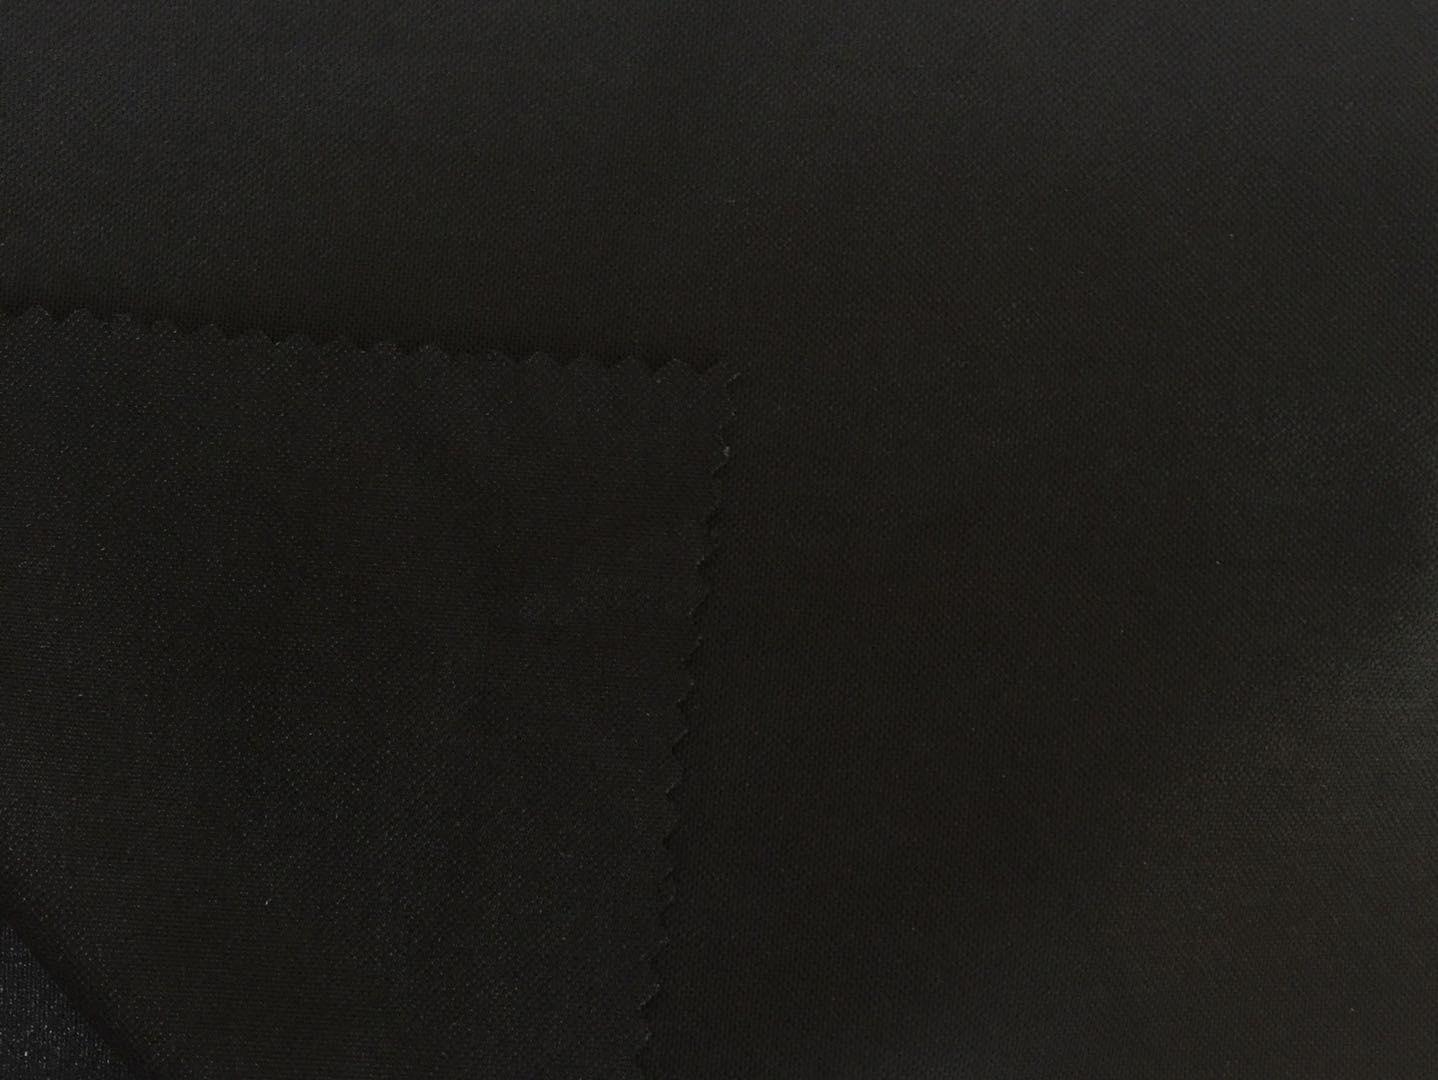 50s imitation tencel NR fabric